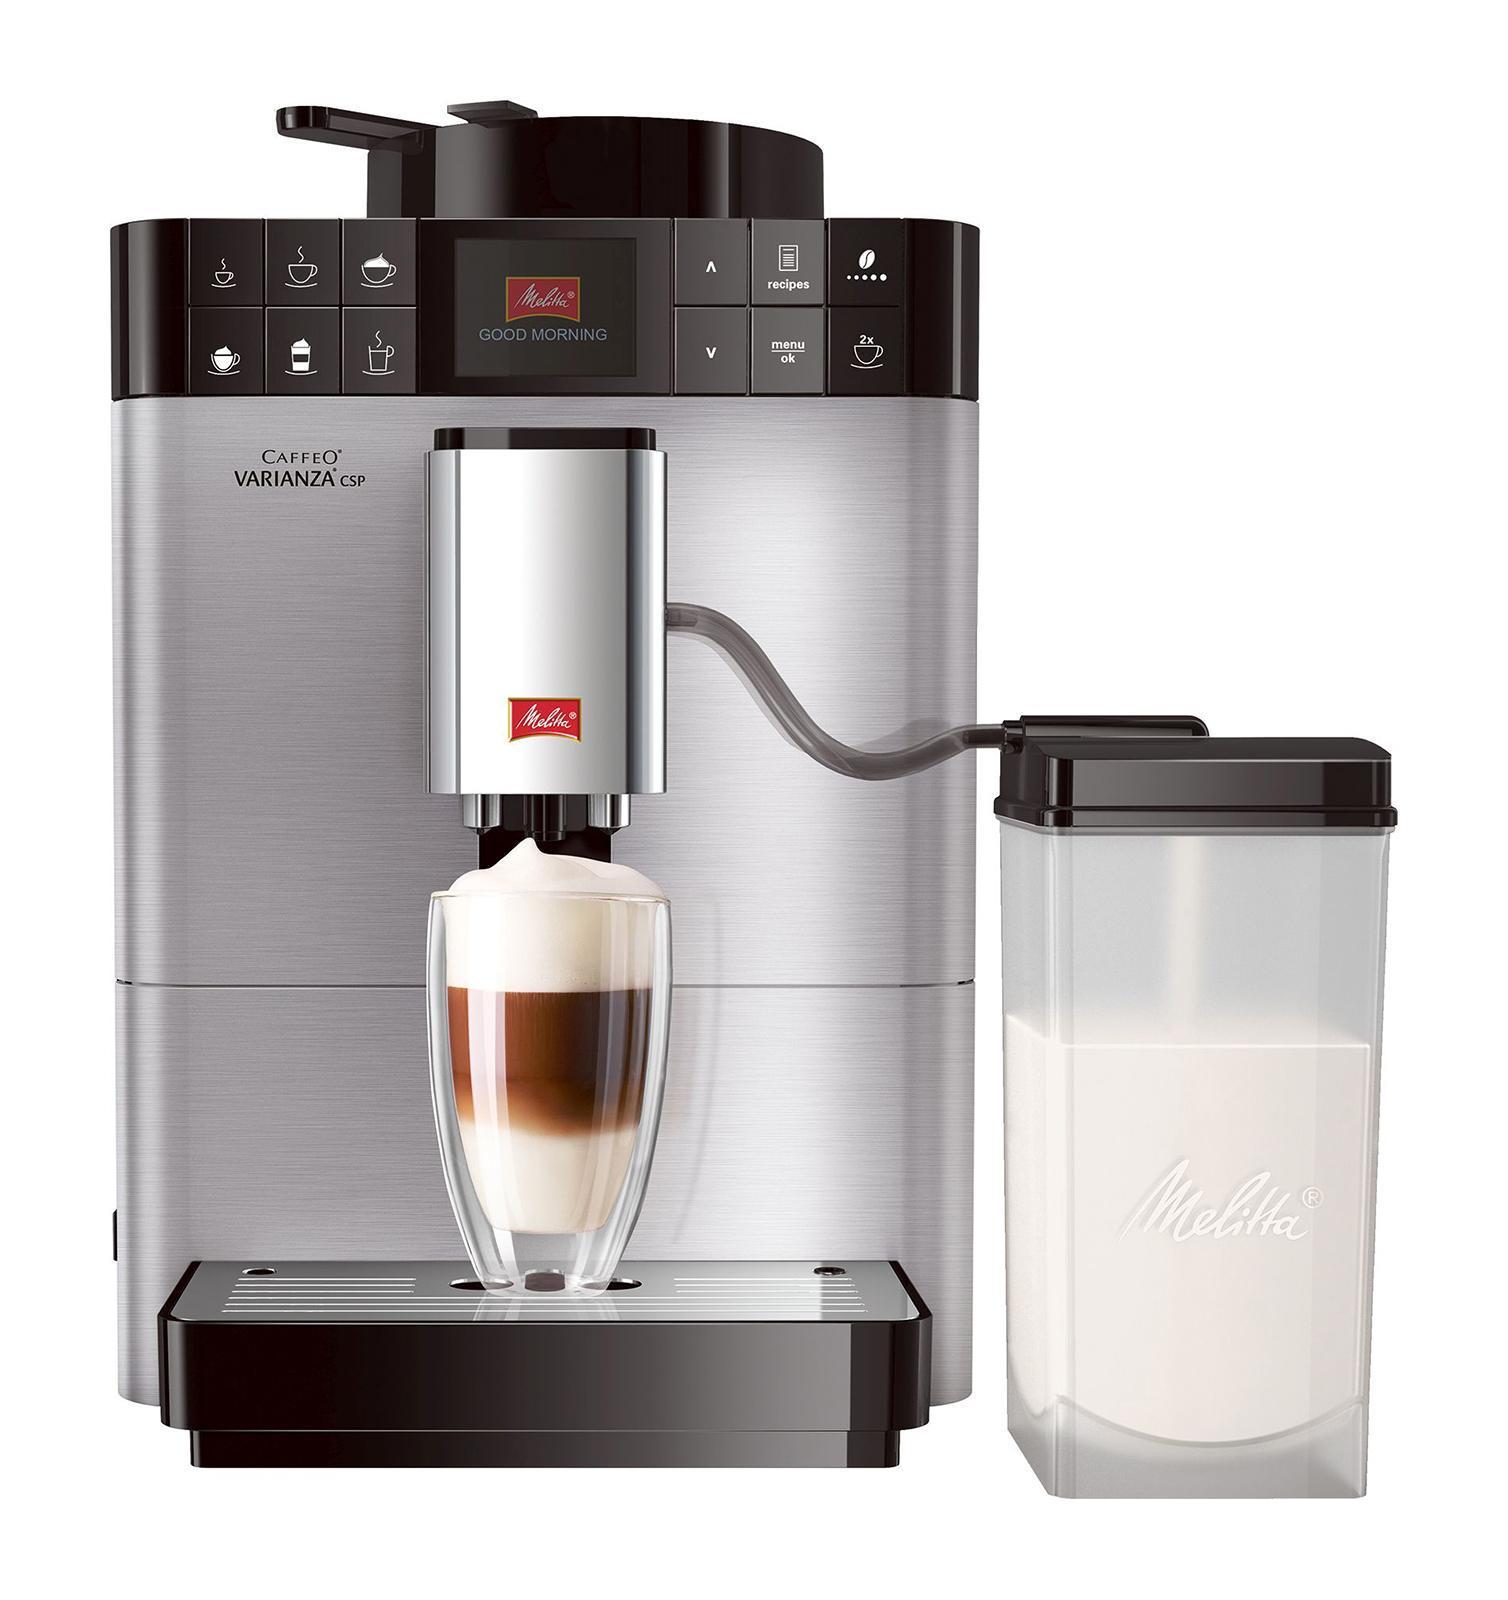 Melitta Caffeo F 570-101 Varianza CSP, Silver кофемашина кофемашина jura a9 aluminium 15118 1450вт 15бар автокапуч